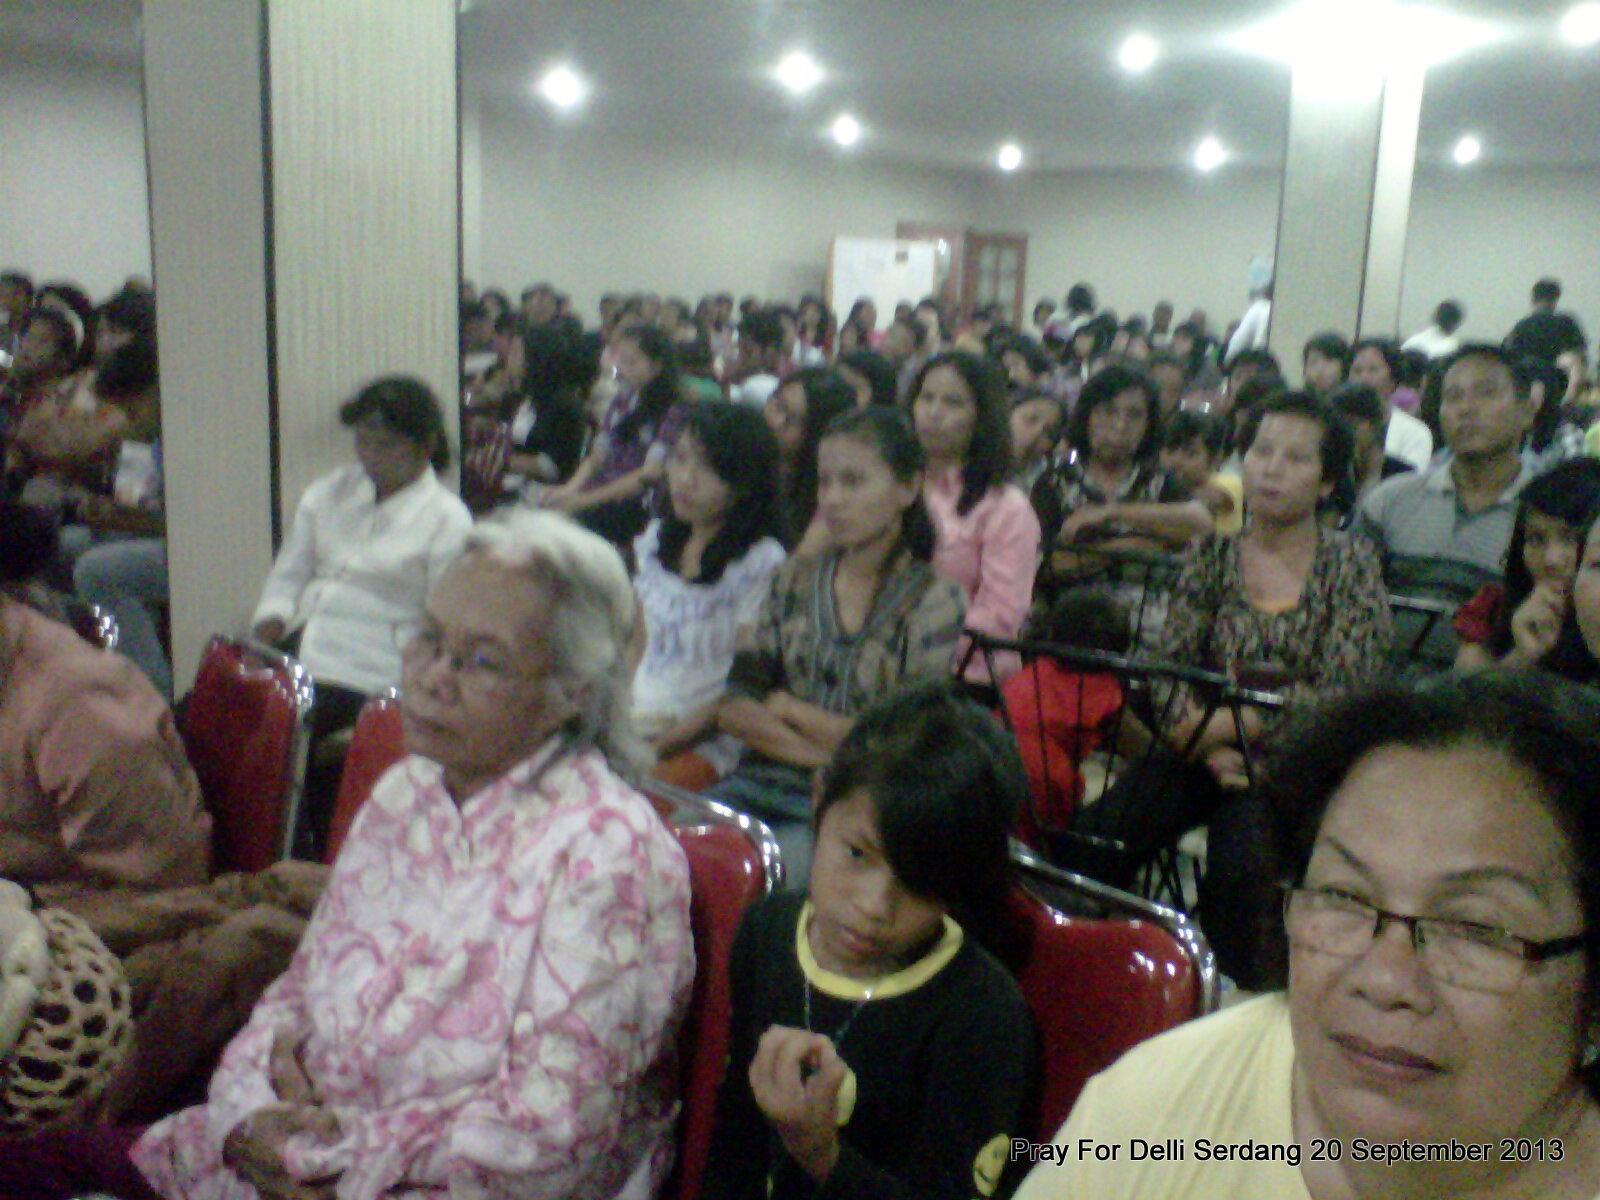 pf-deli-serdang-2013-2